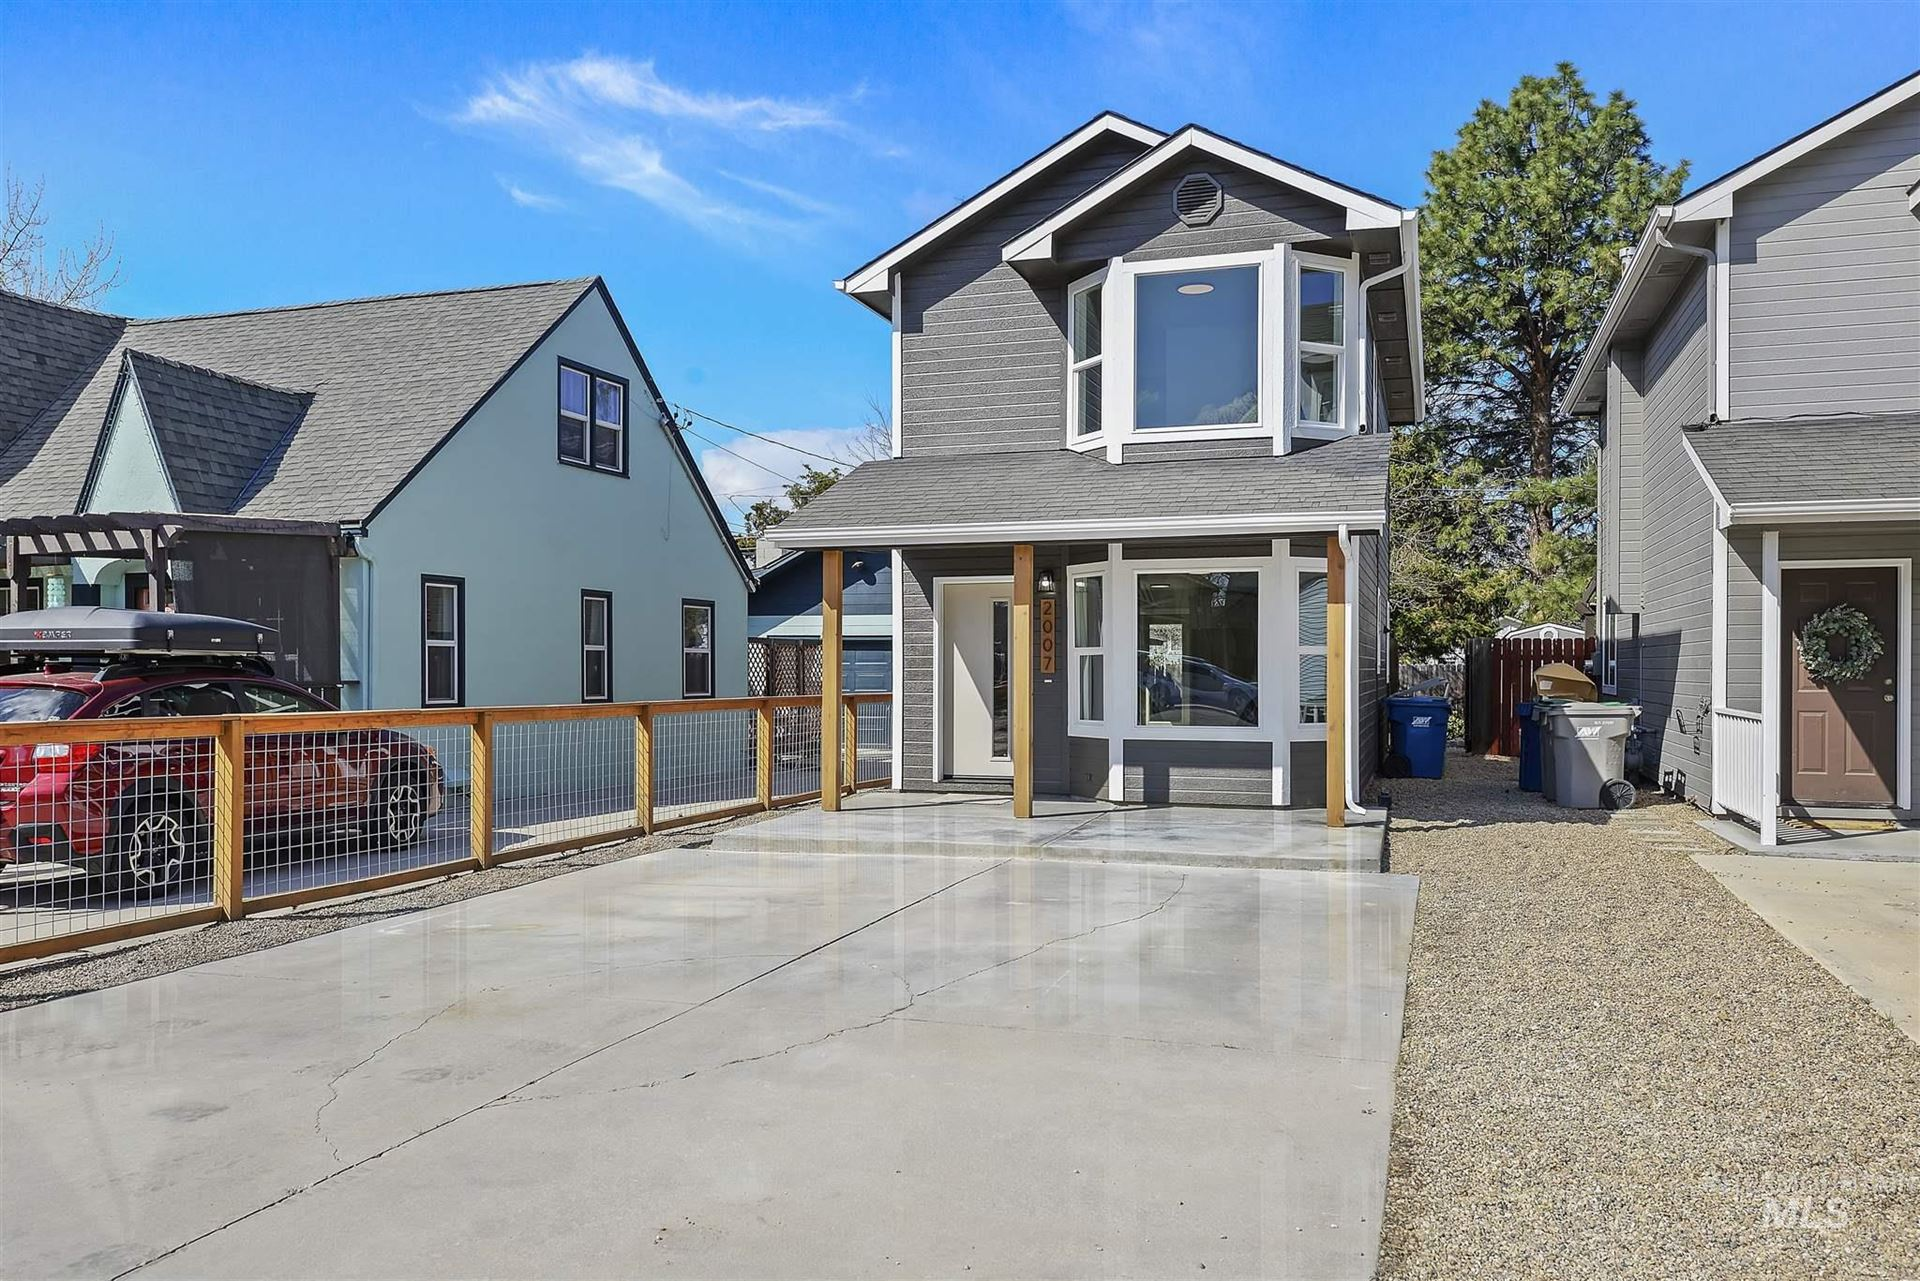 Photo of 2007 S Arcadia, Boise, ID 83705 (MLS # 98799160)